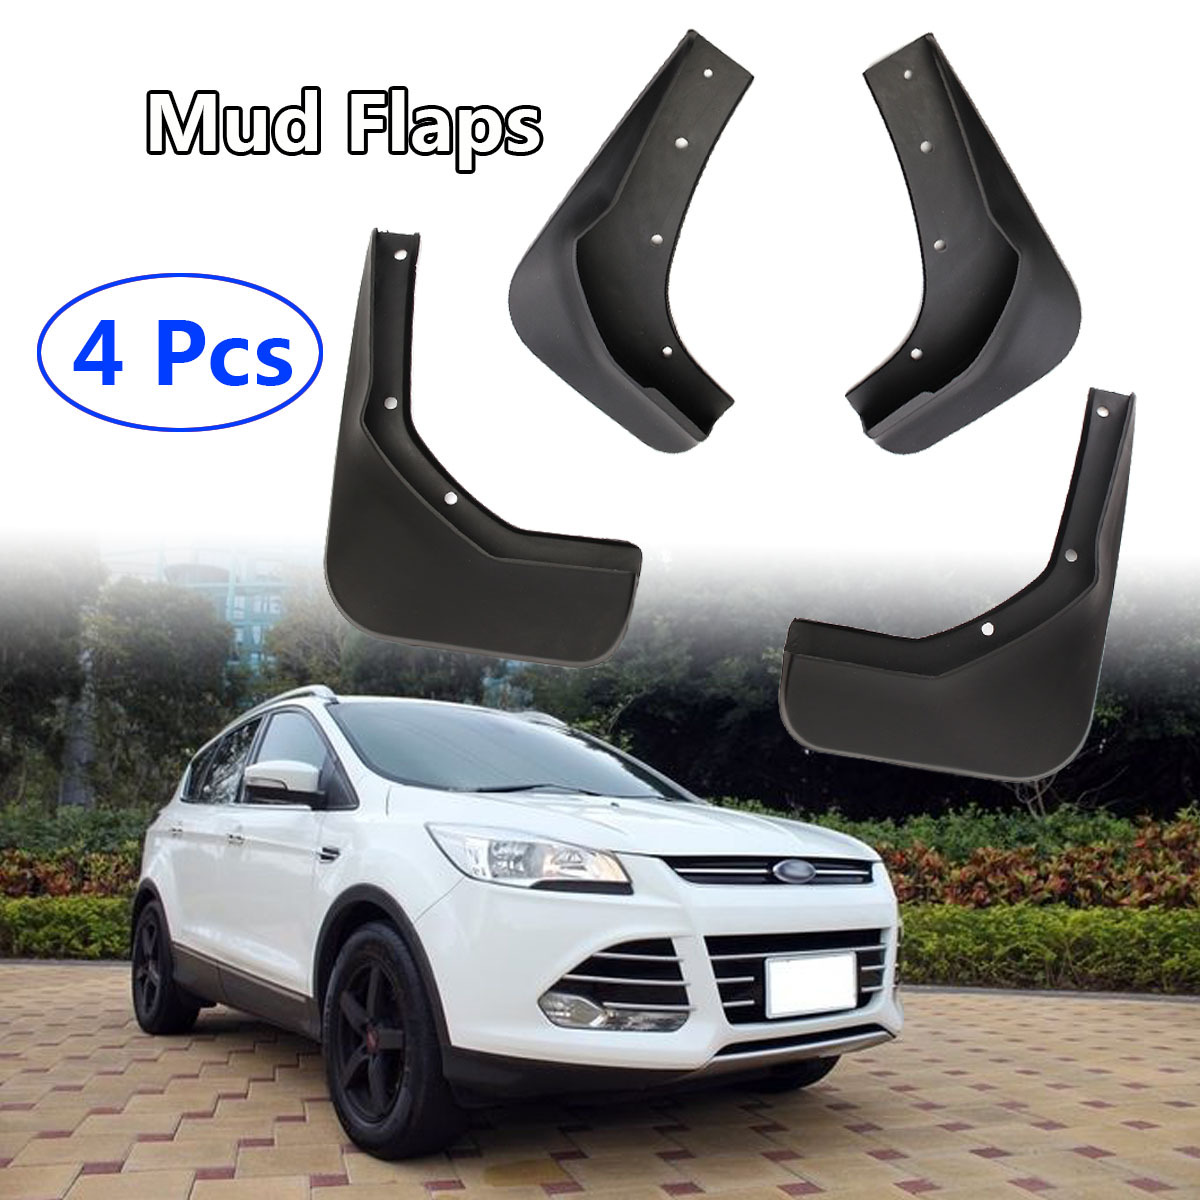 4pcs Front + Rear Mud Flaps Splash Guards Mudguards Fender For Ford ESCAPE KUGA For Escape Kuga 2013 2014 2015